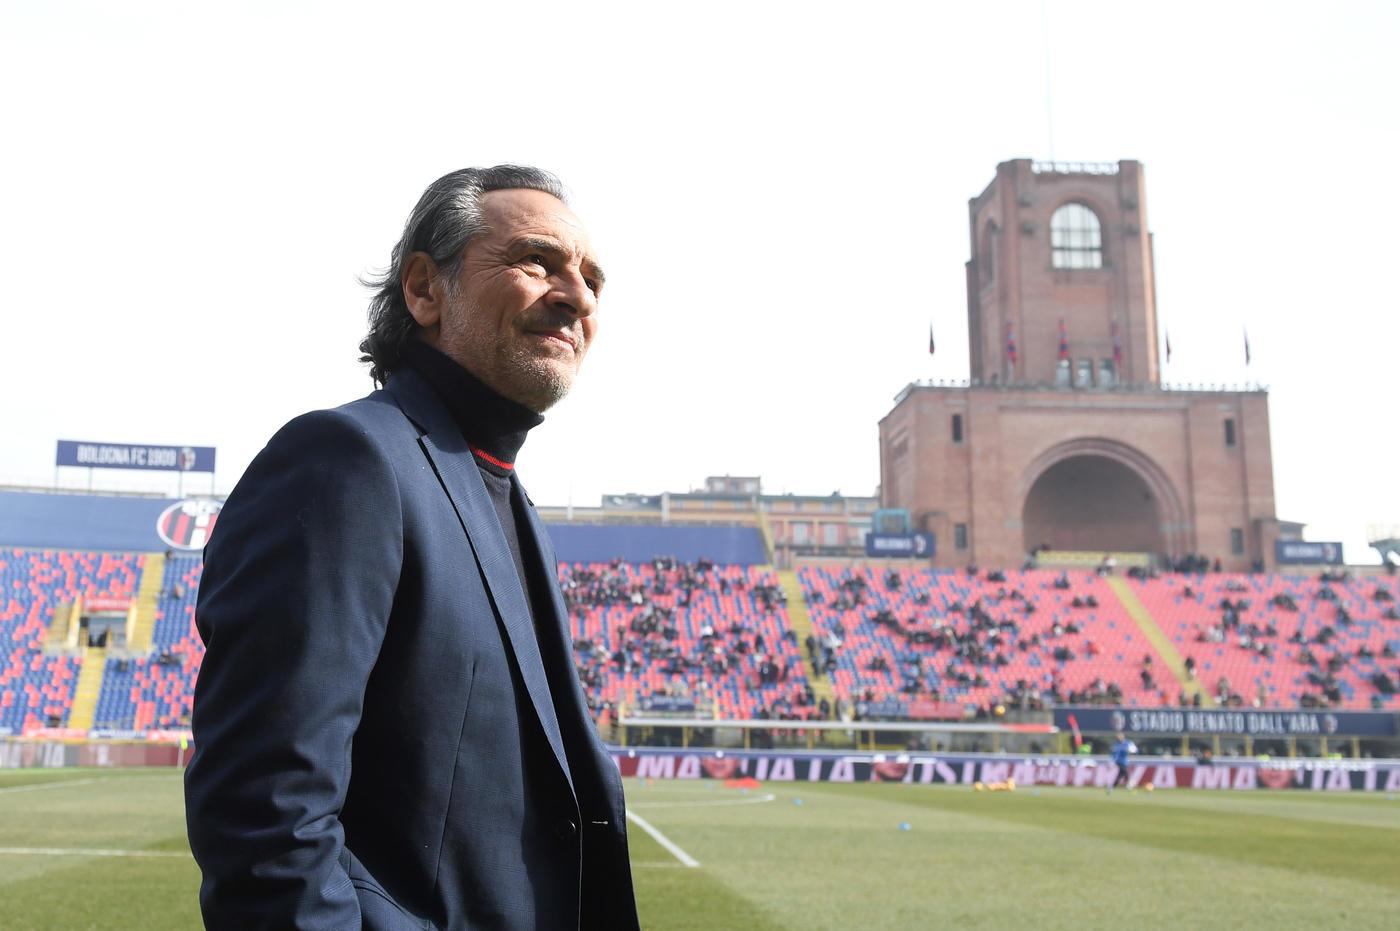 Serie A, Bologna-Genoa 1-1: Lerager risponde a Destro